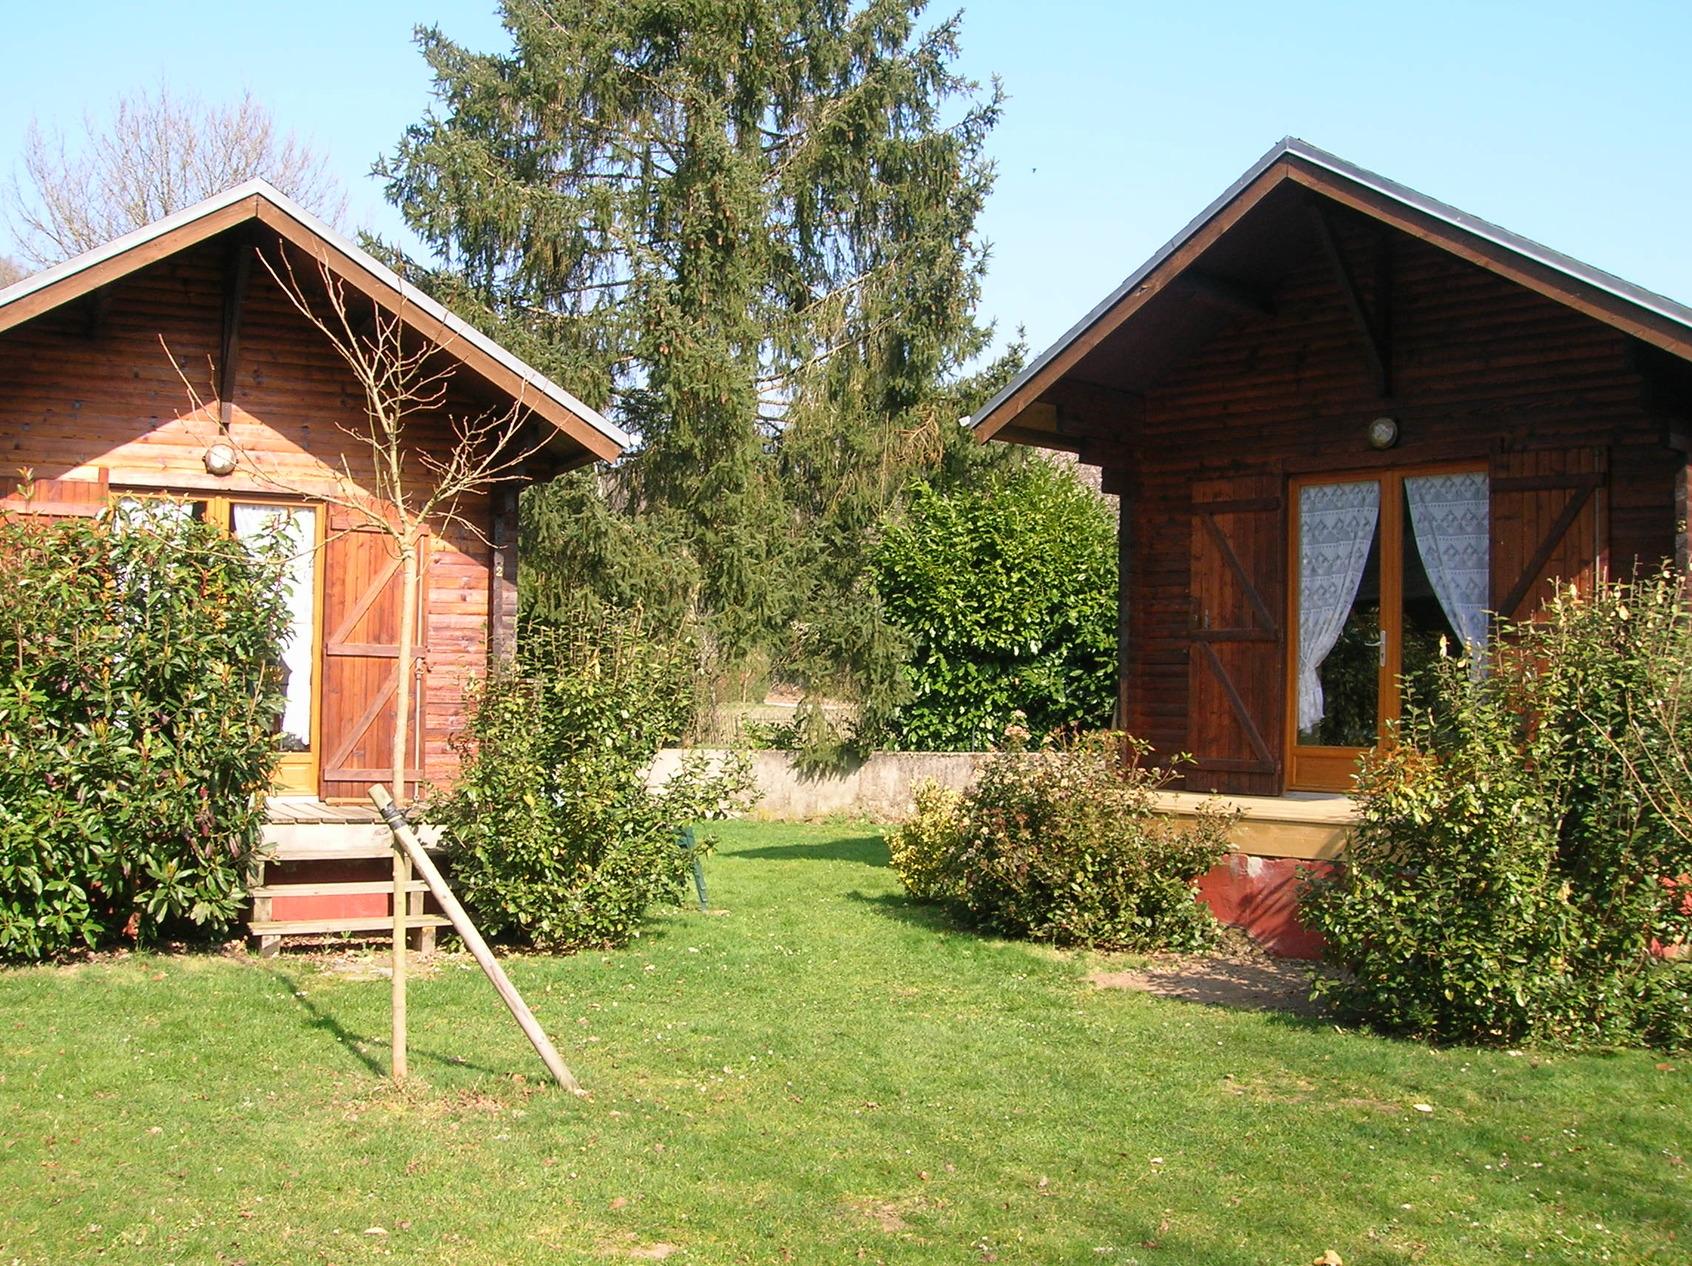 Camping La Chaumerette Gargilesse